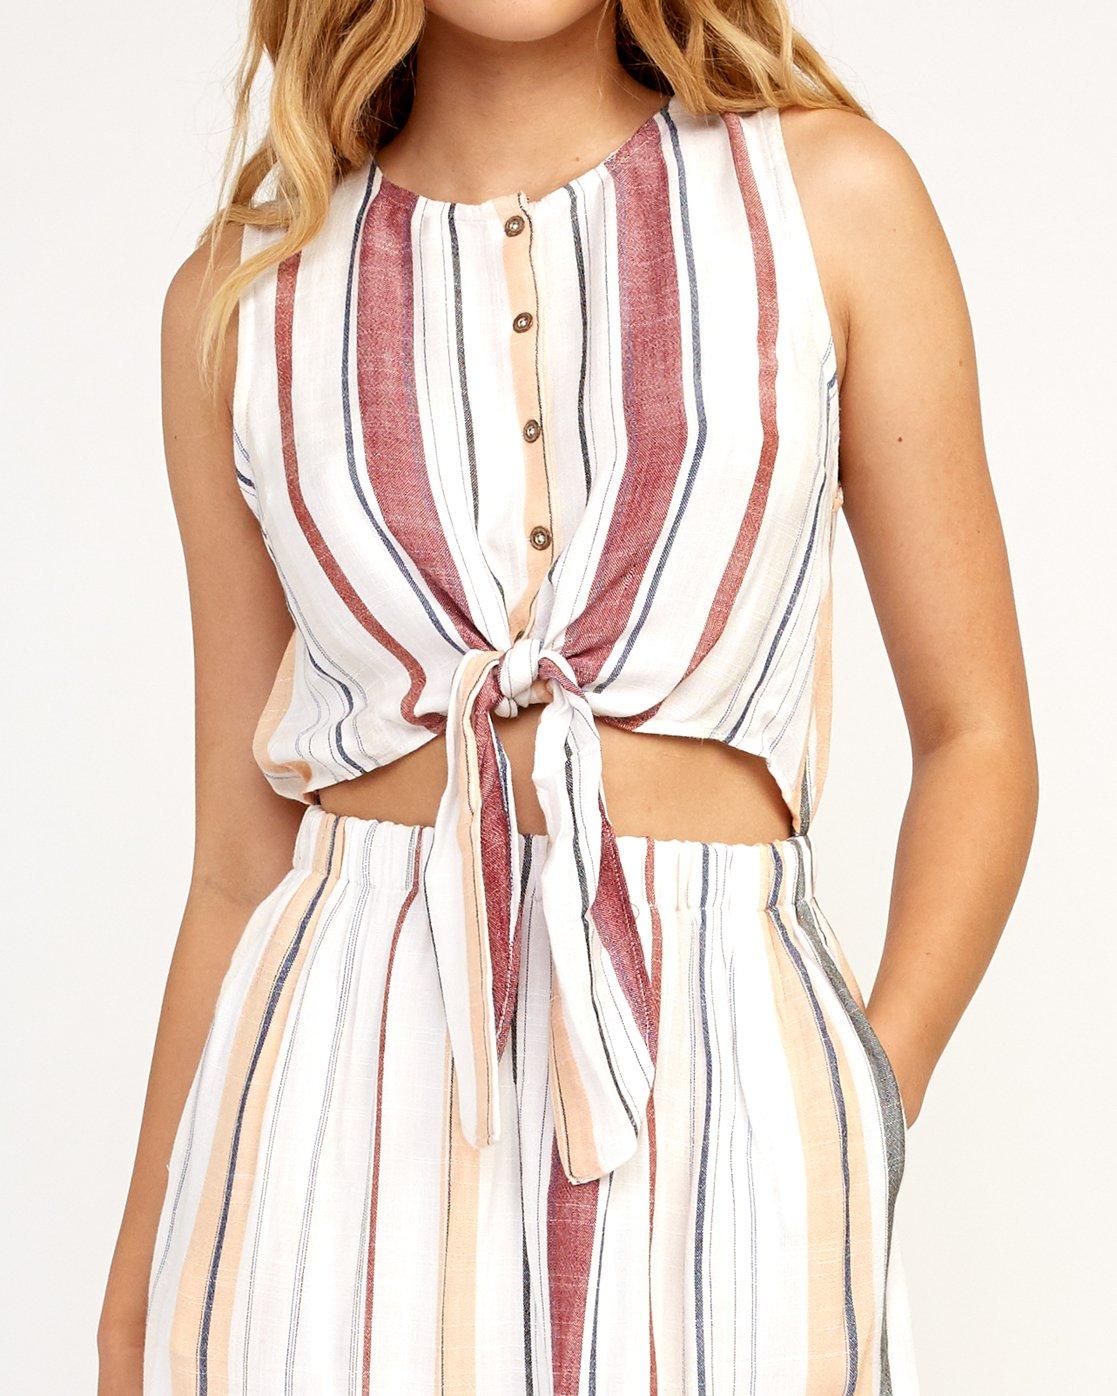 5 Arizona Dress White N3DRRPRVP9 RVCA